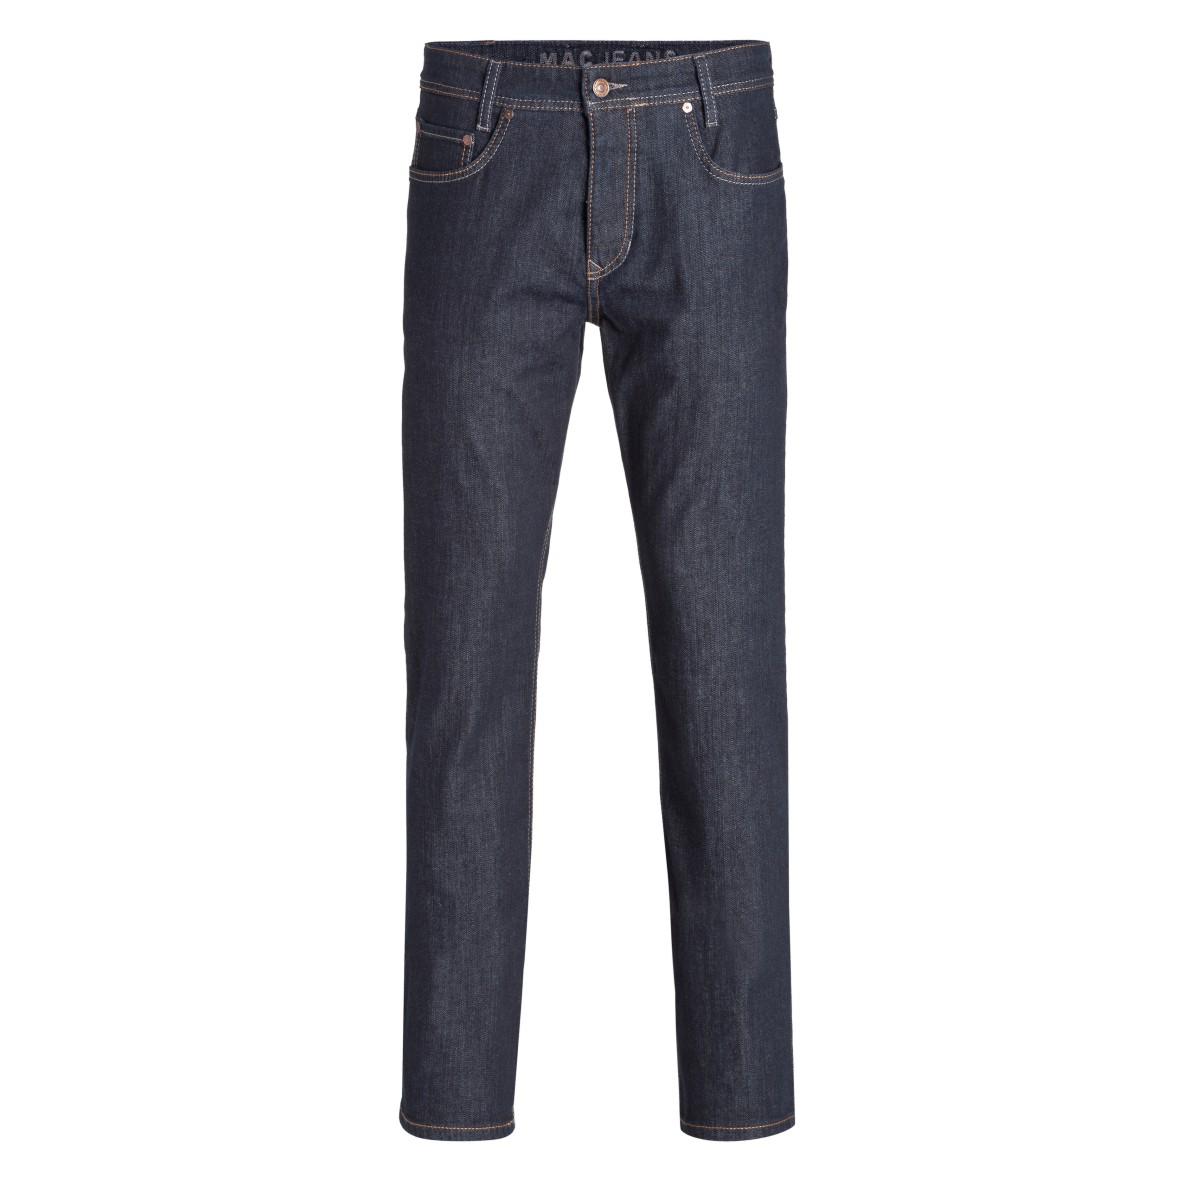 mac herren jeans arne dark blue siemers online shop. Black Bedroom Furniture Sets. Home Design Ideas